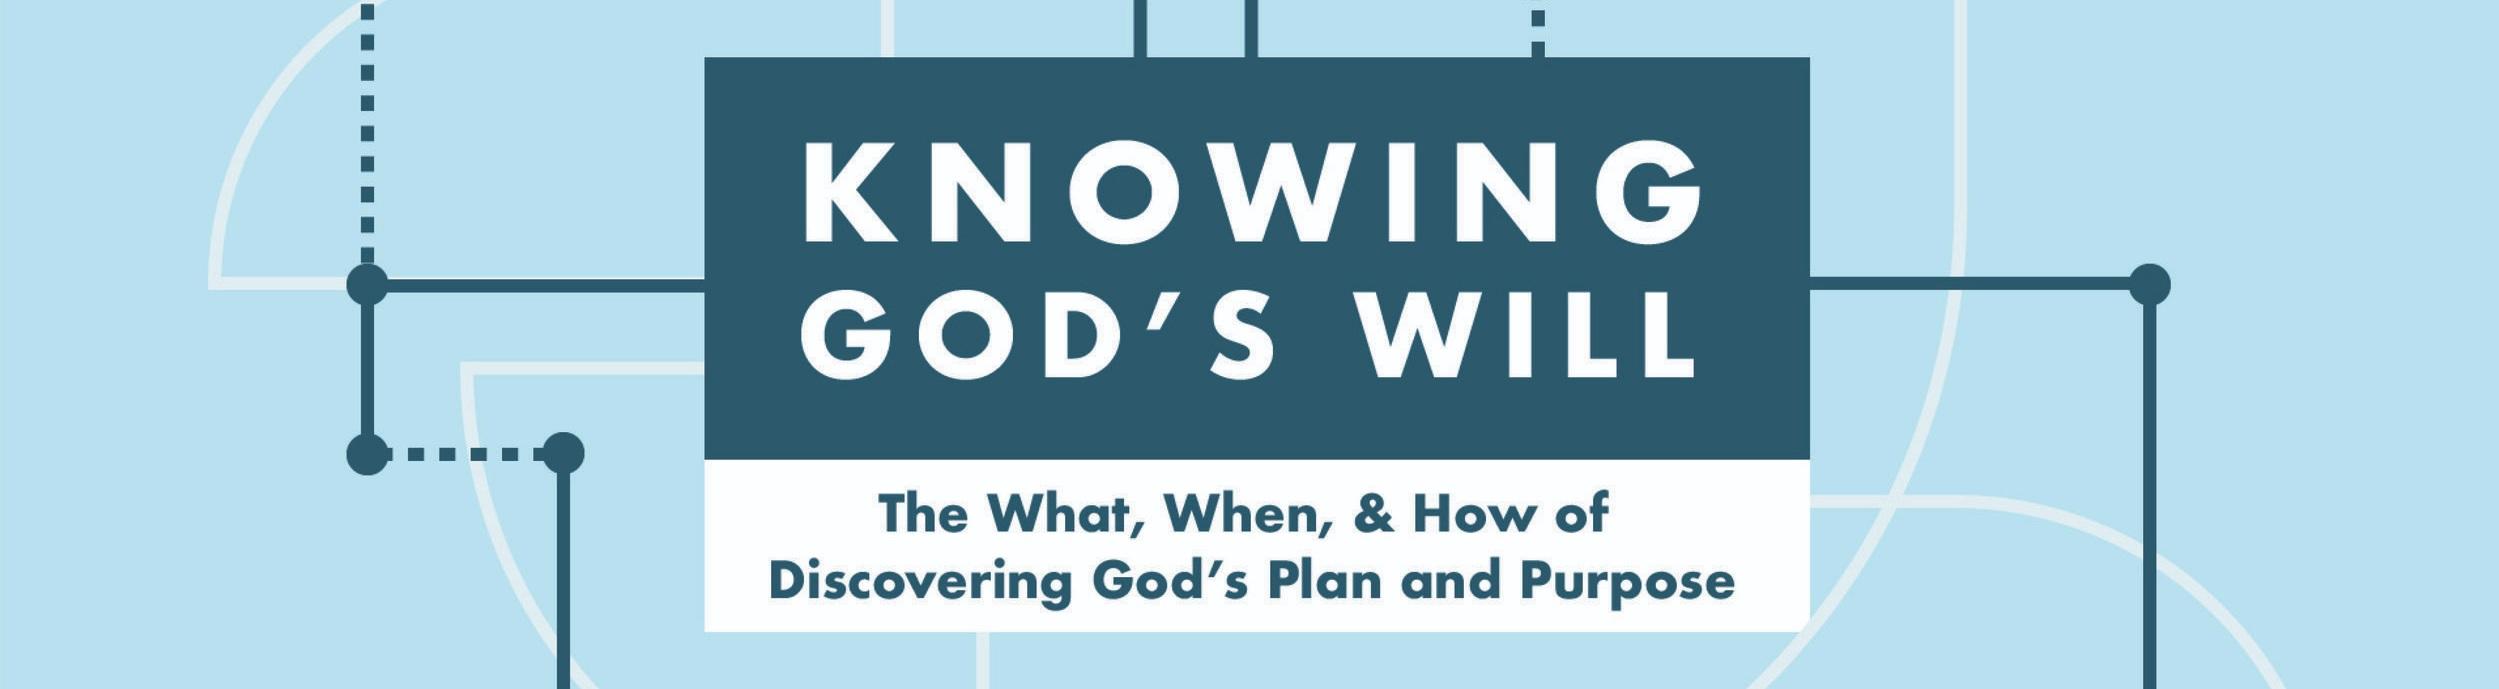 Knowing+Gods+Will.jpg